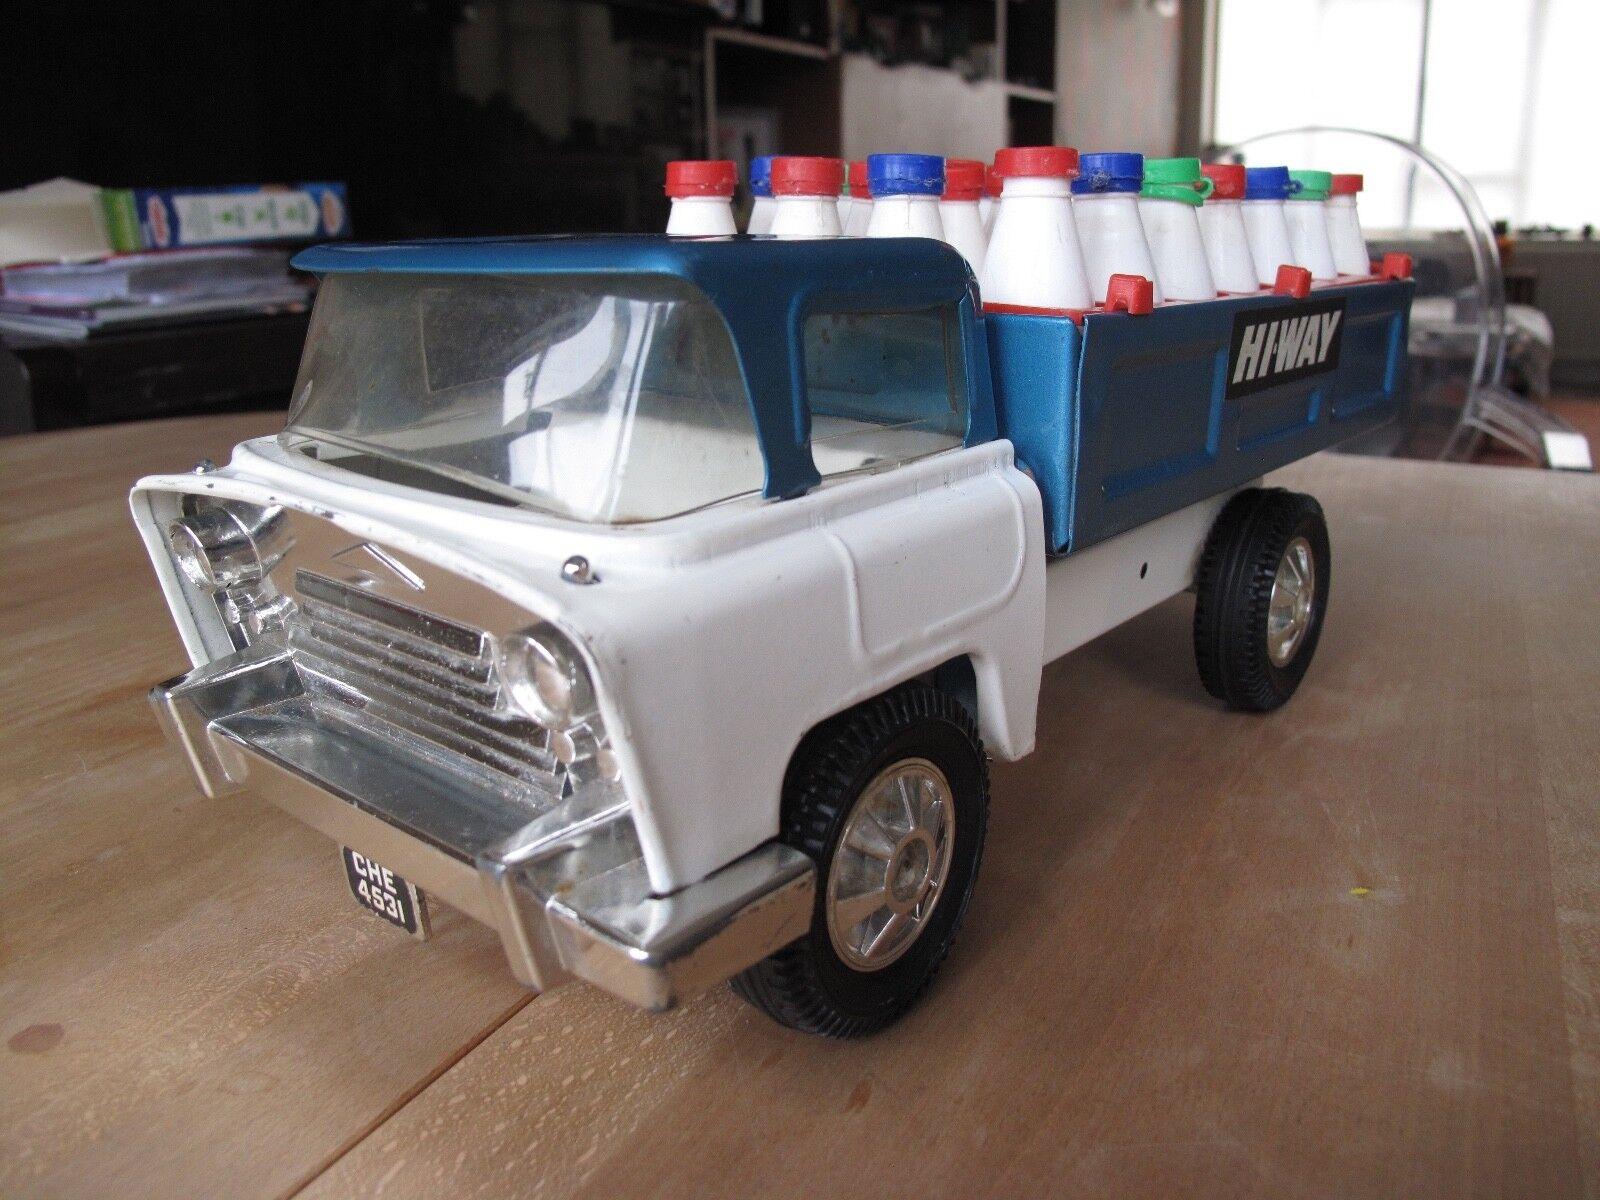 Tri-ang Vintage Hi-Way Milk Truck Unrestored Original. It's Christmas